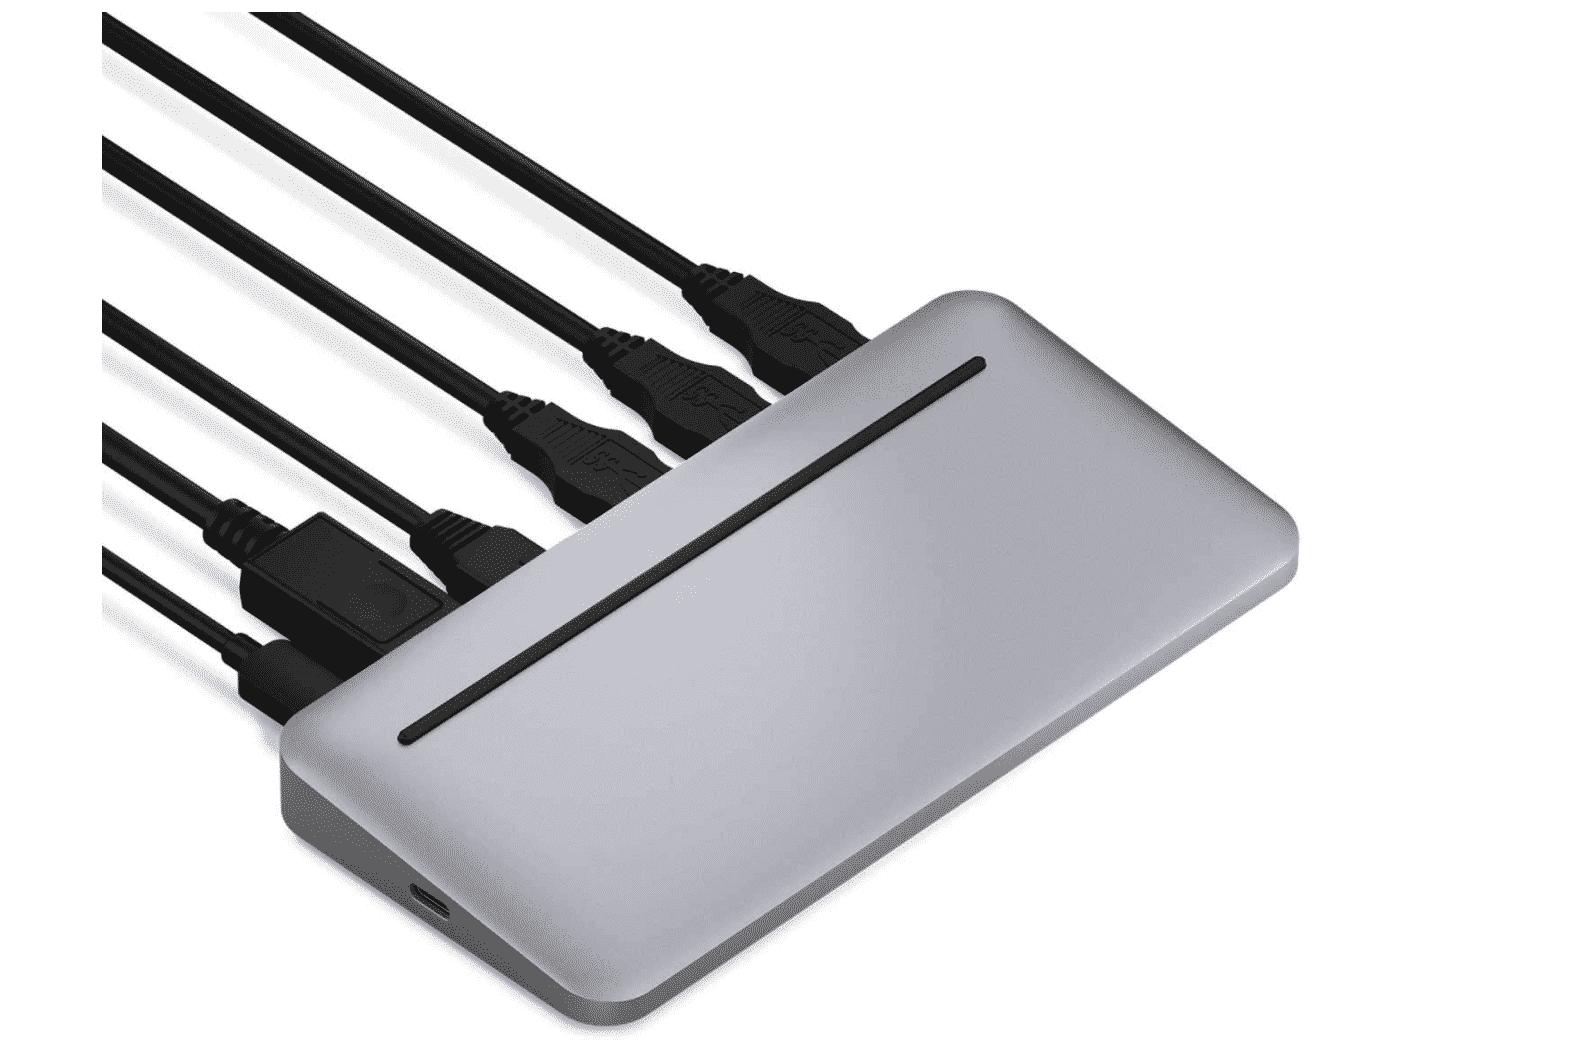 Brydge Stone II USB-C Multiport Desktop Hub